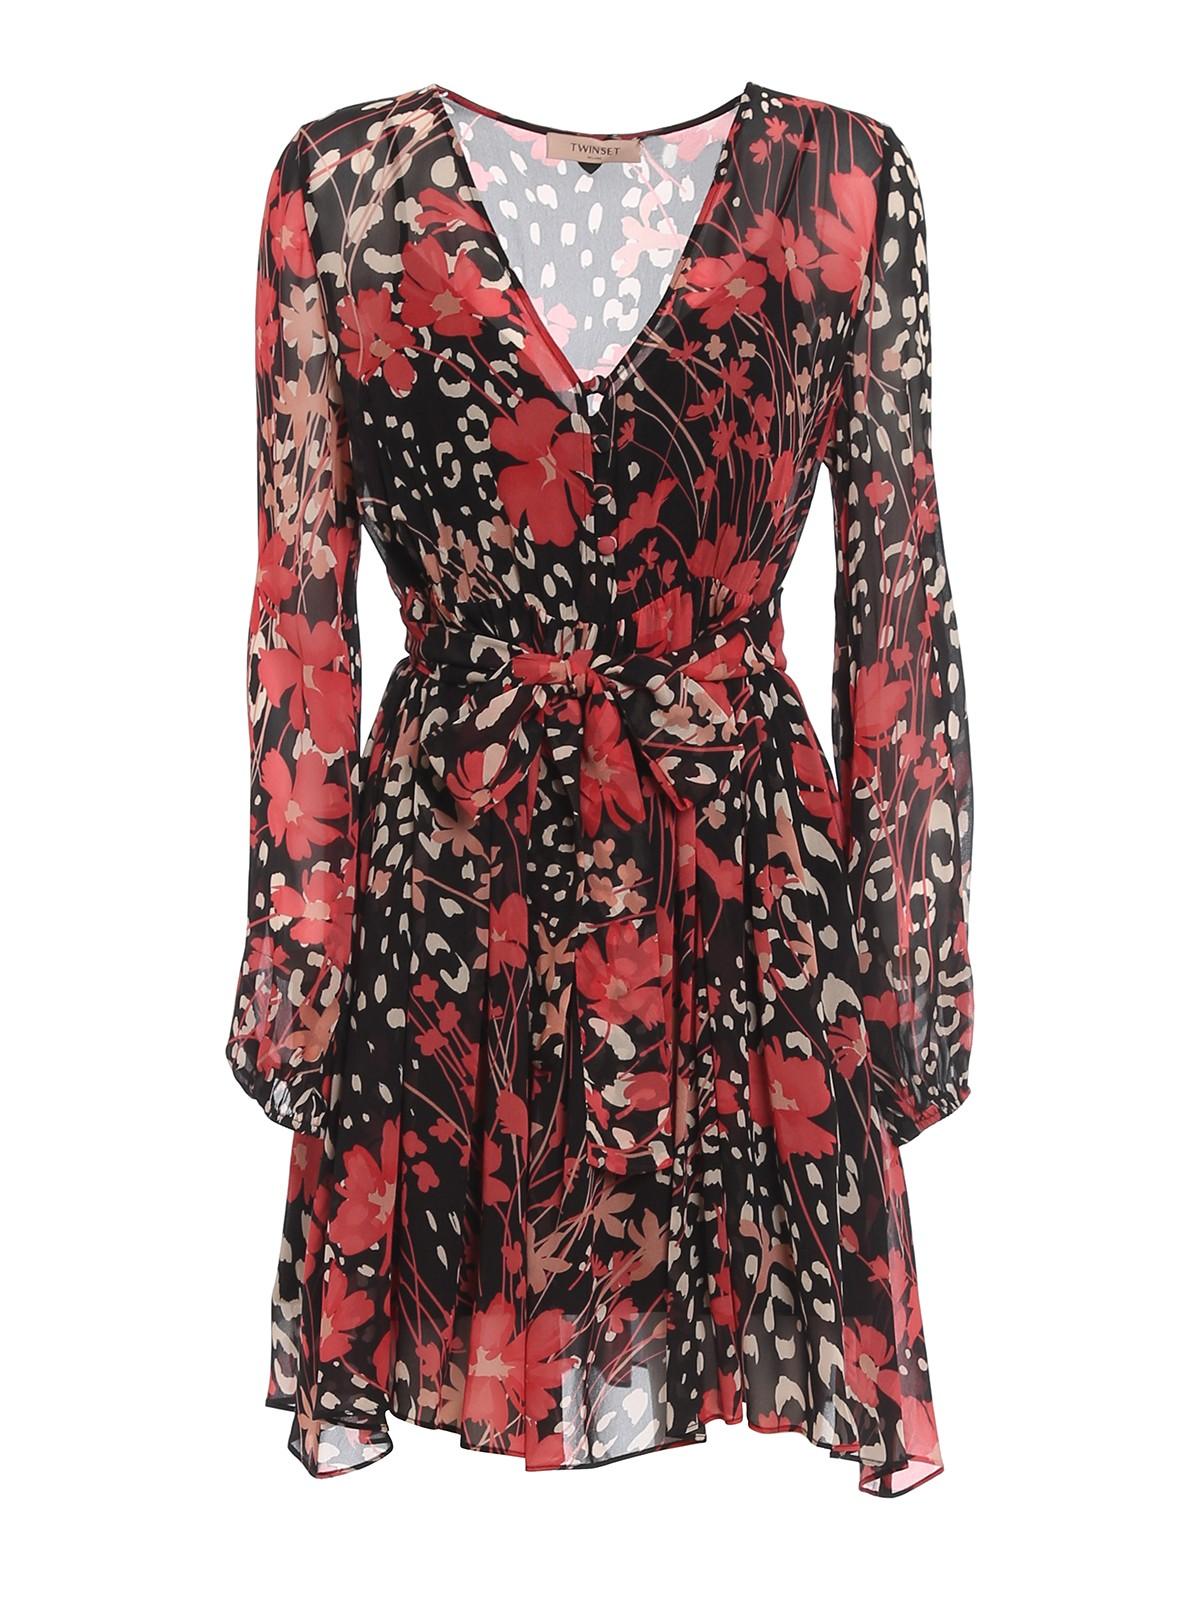 Twinset GEORGETTE VISCOSE SHORT DRESS